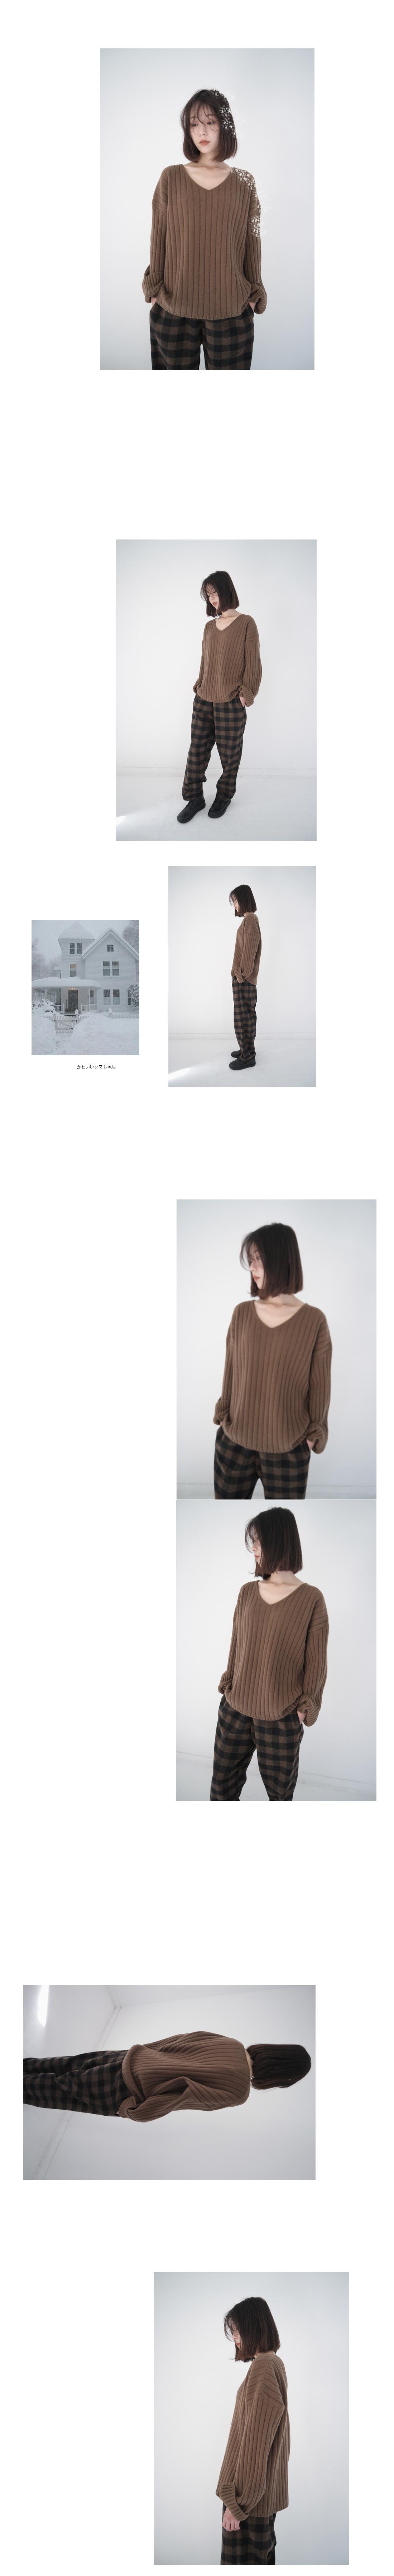 wide golgi V-neck knit (5colors)